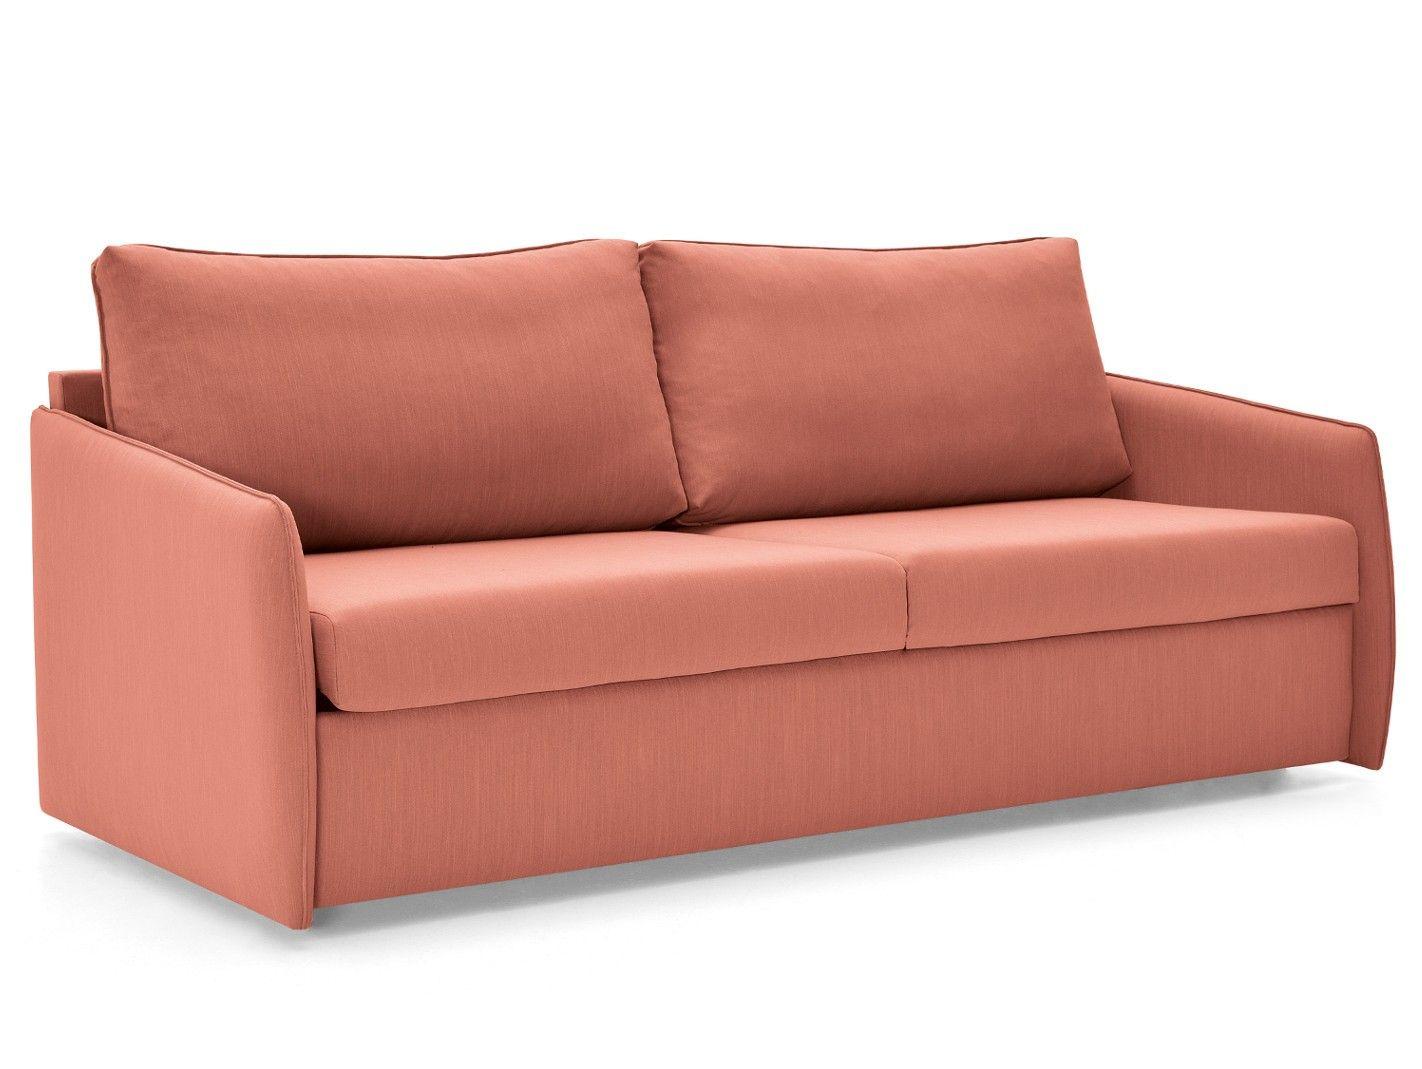 mi sofa las palmas catalogo gallery of ofertas de